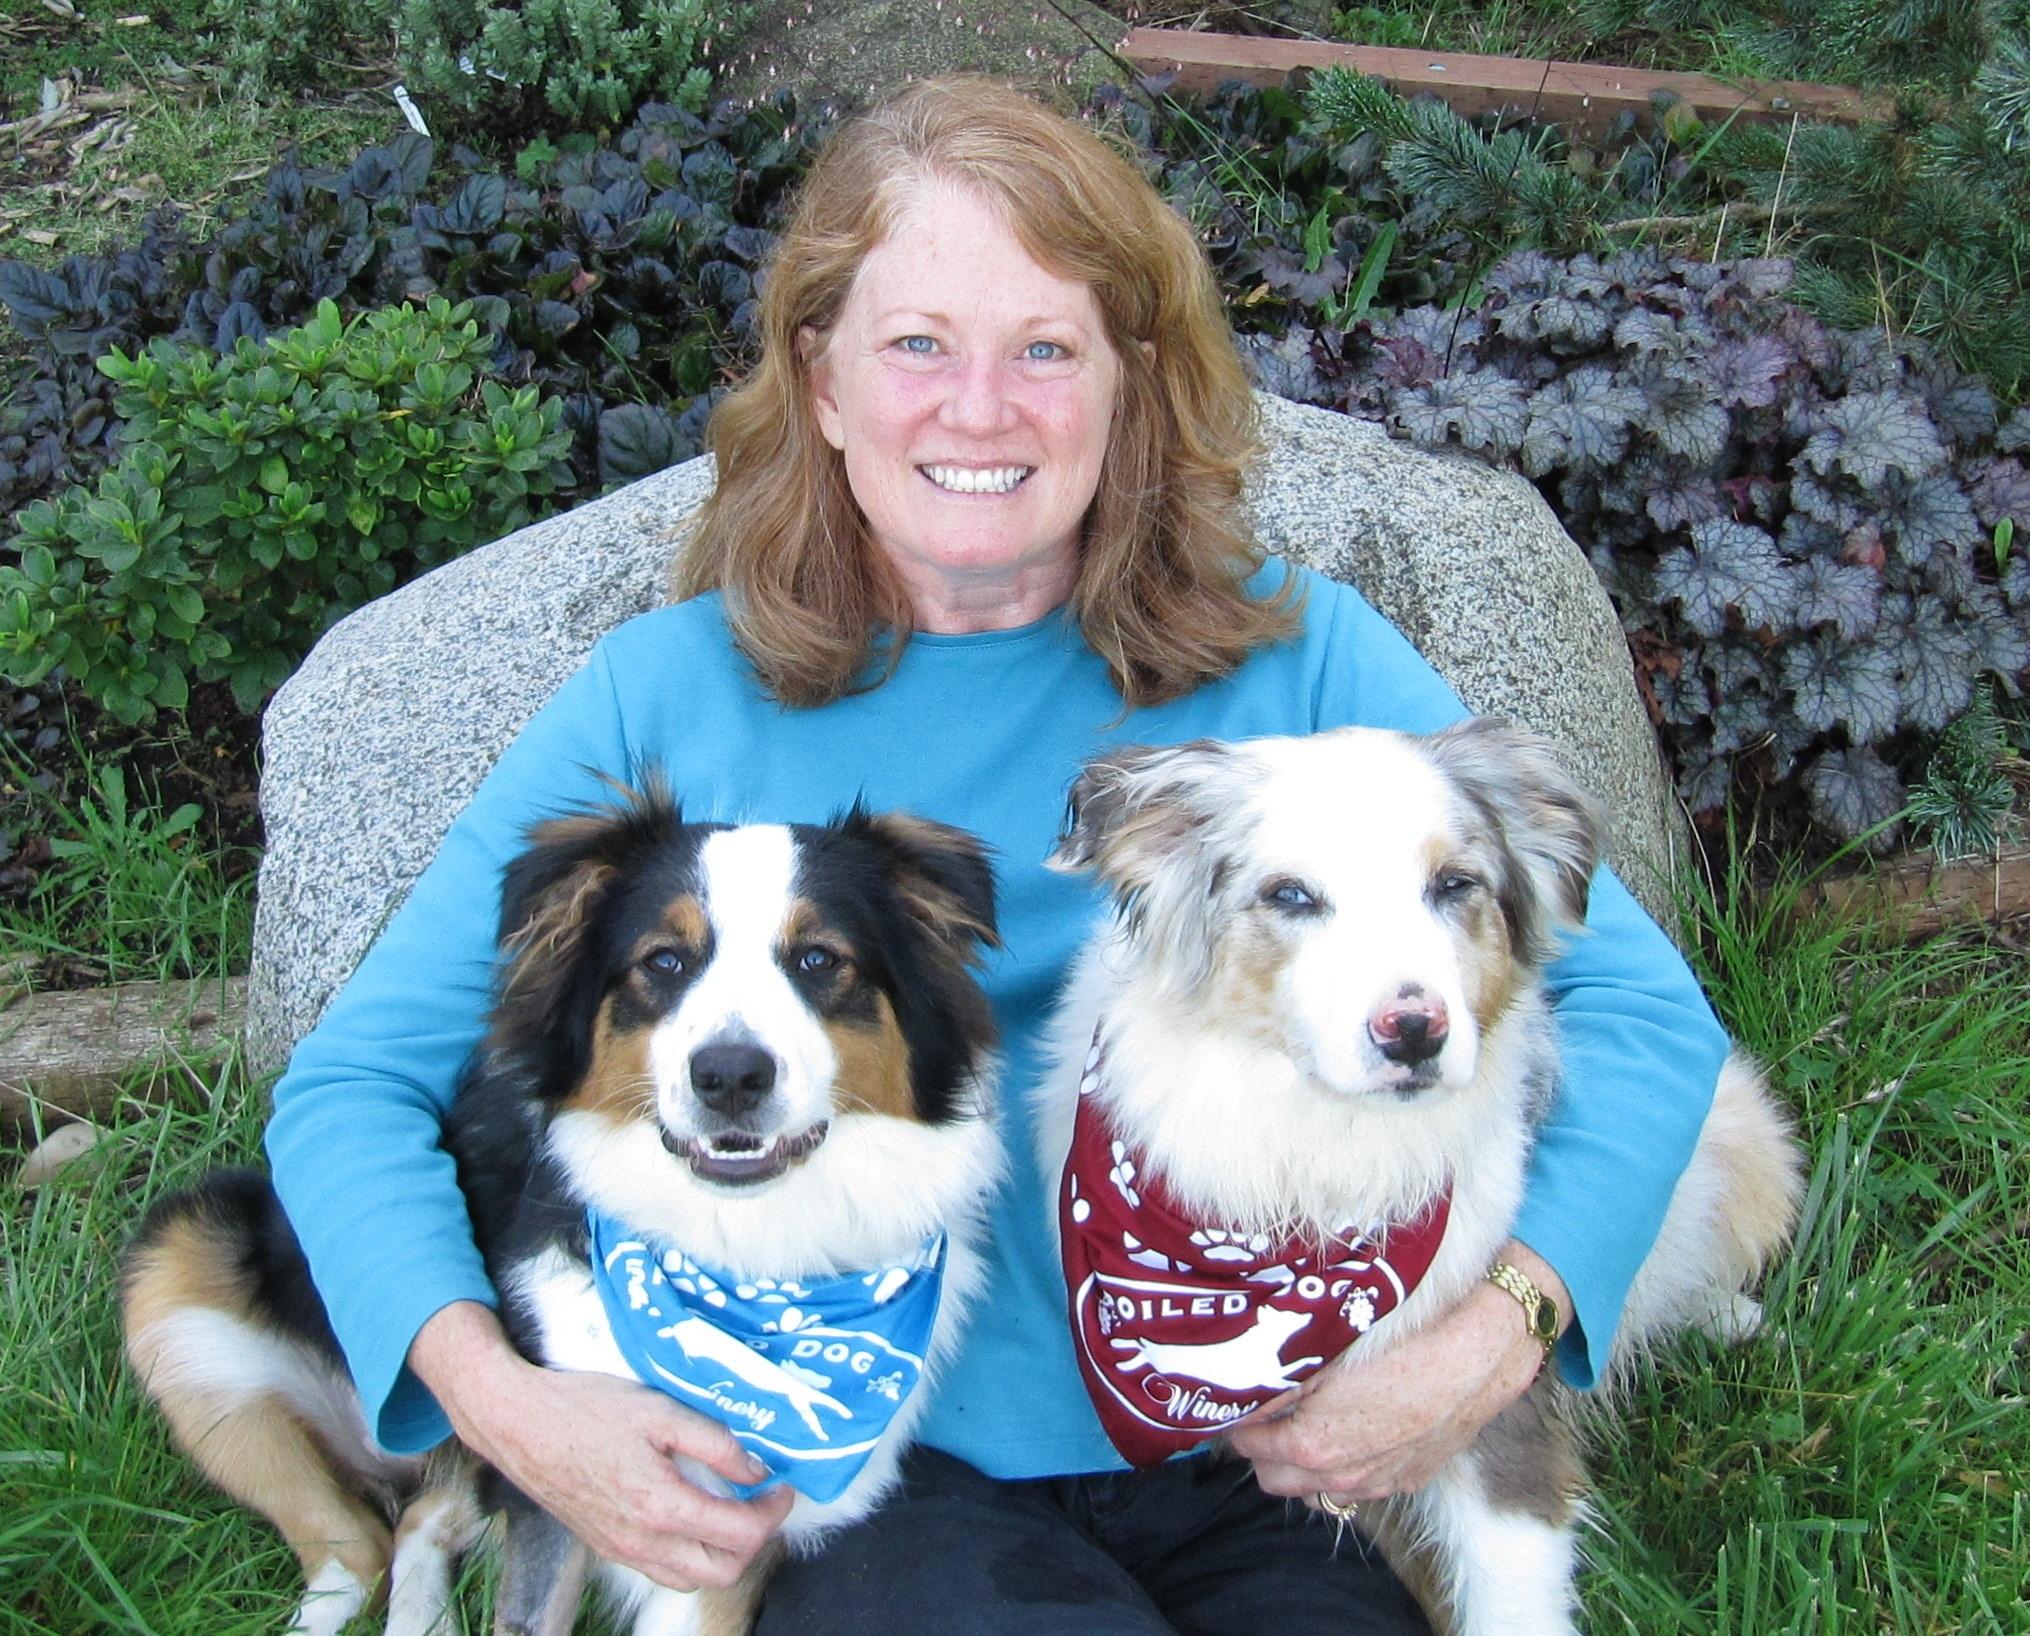 PSWG CC Photo SDW Karen and dogs1